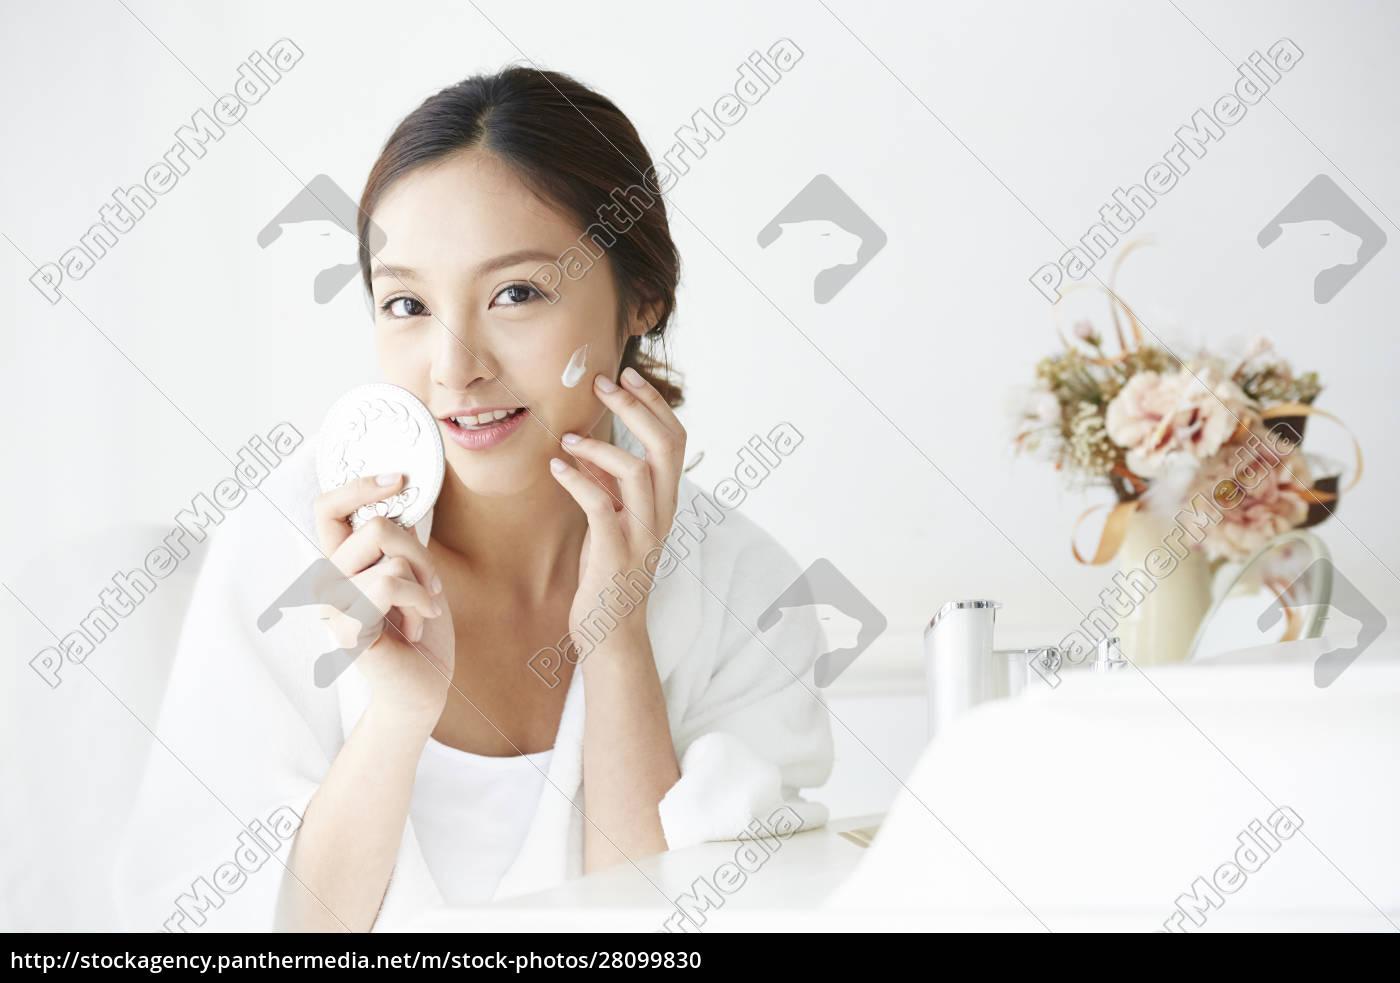 female, beauty, image - 28099830